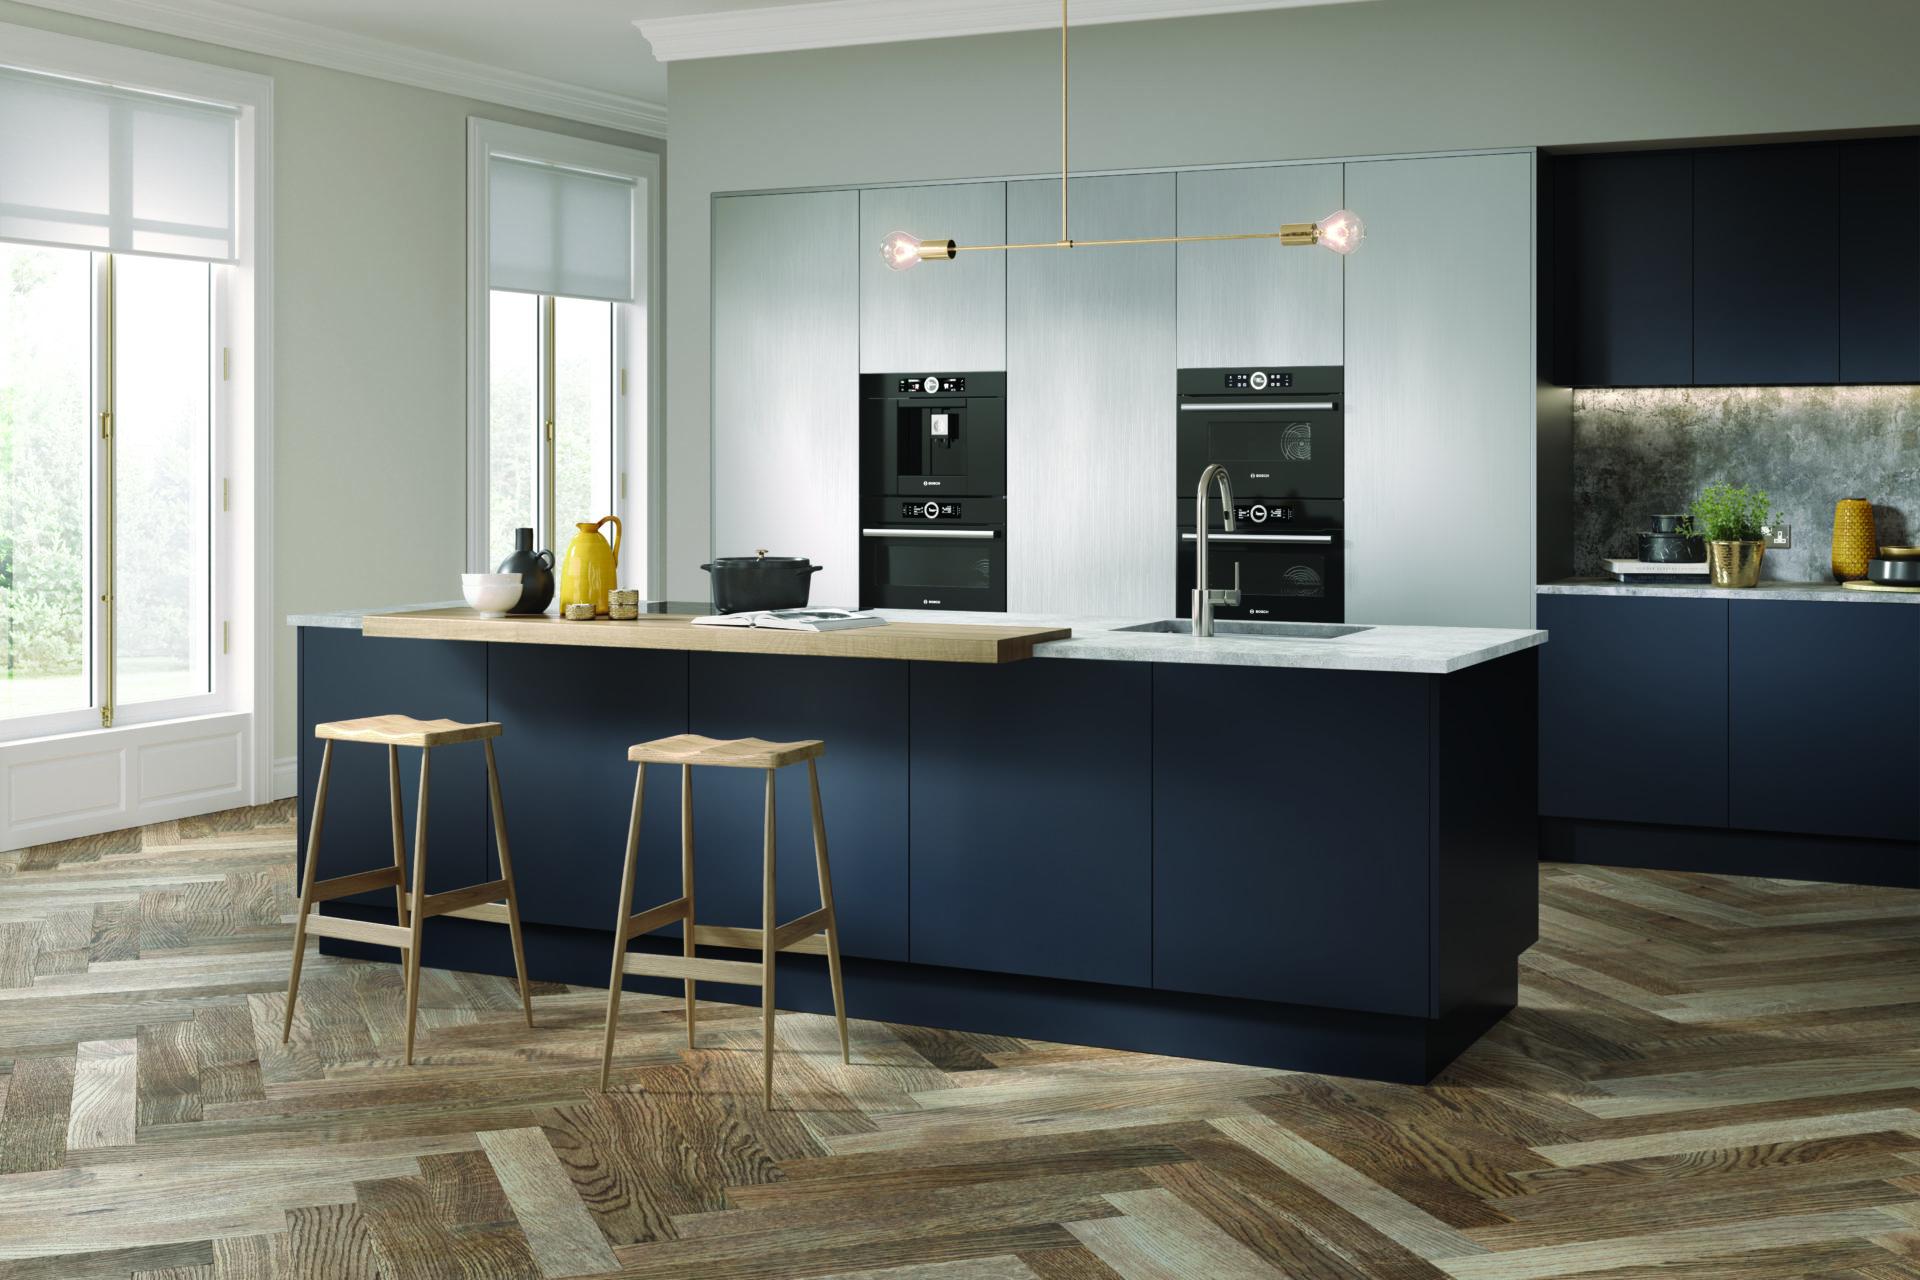 Flat panel blue kitchen